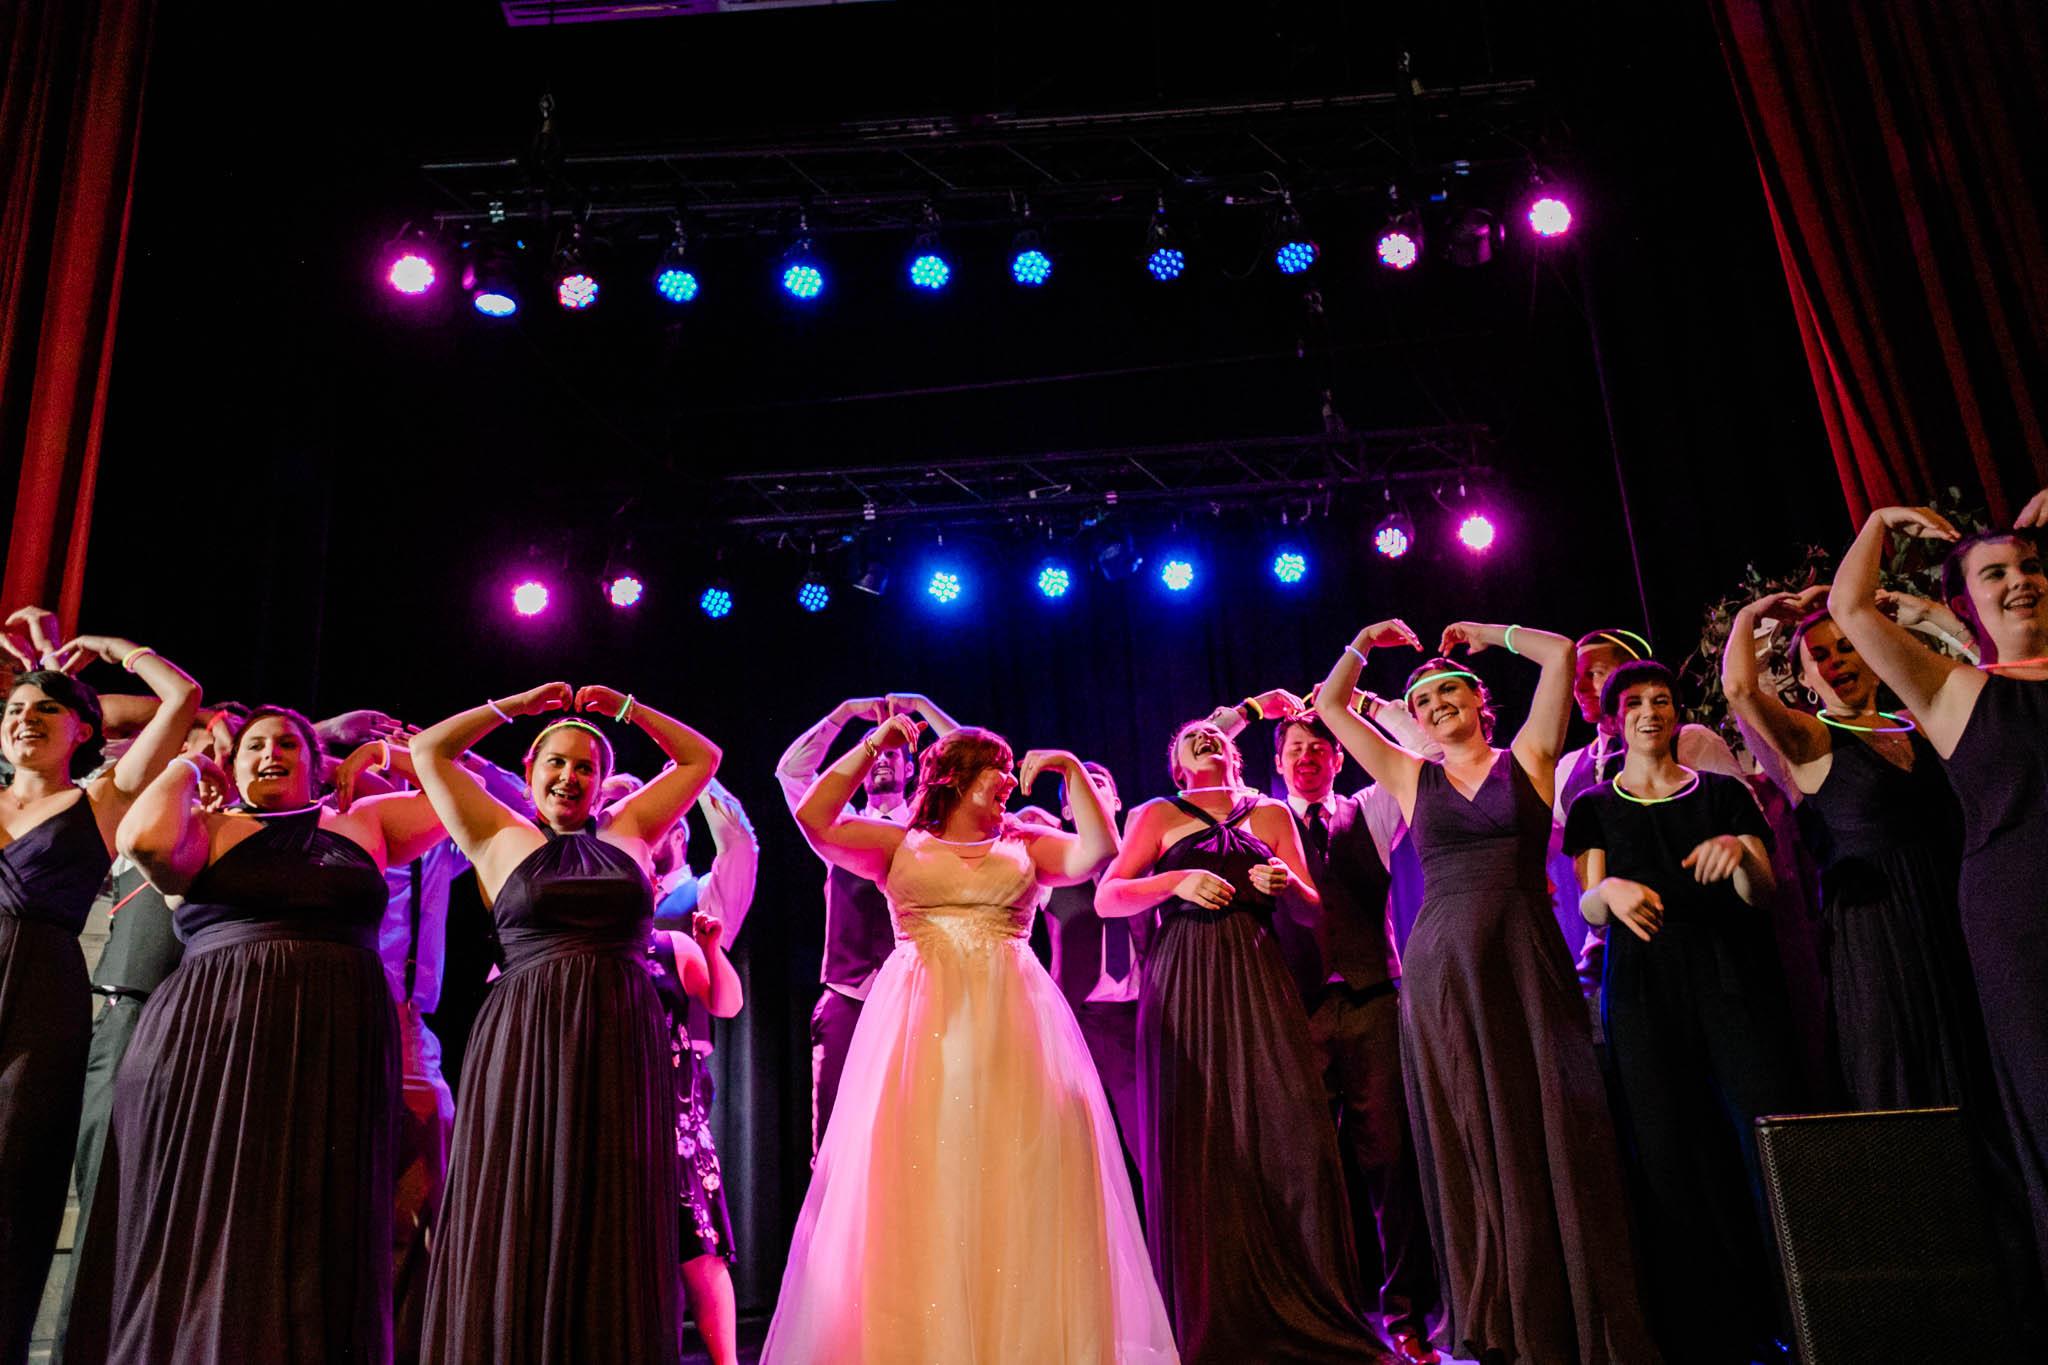 Haw River Ballroom Wedding   Durham Wedding Photographer   By G. Lin Photography   Wedding party dancing to YMCA